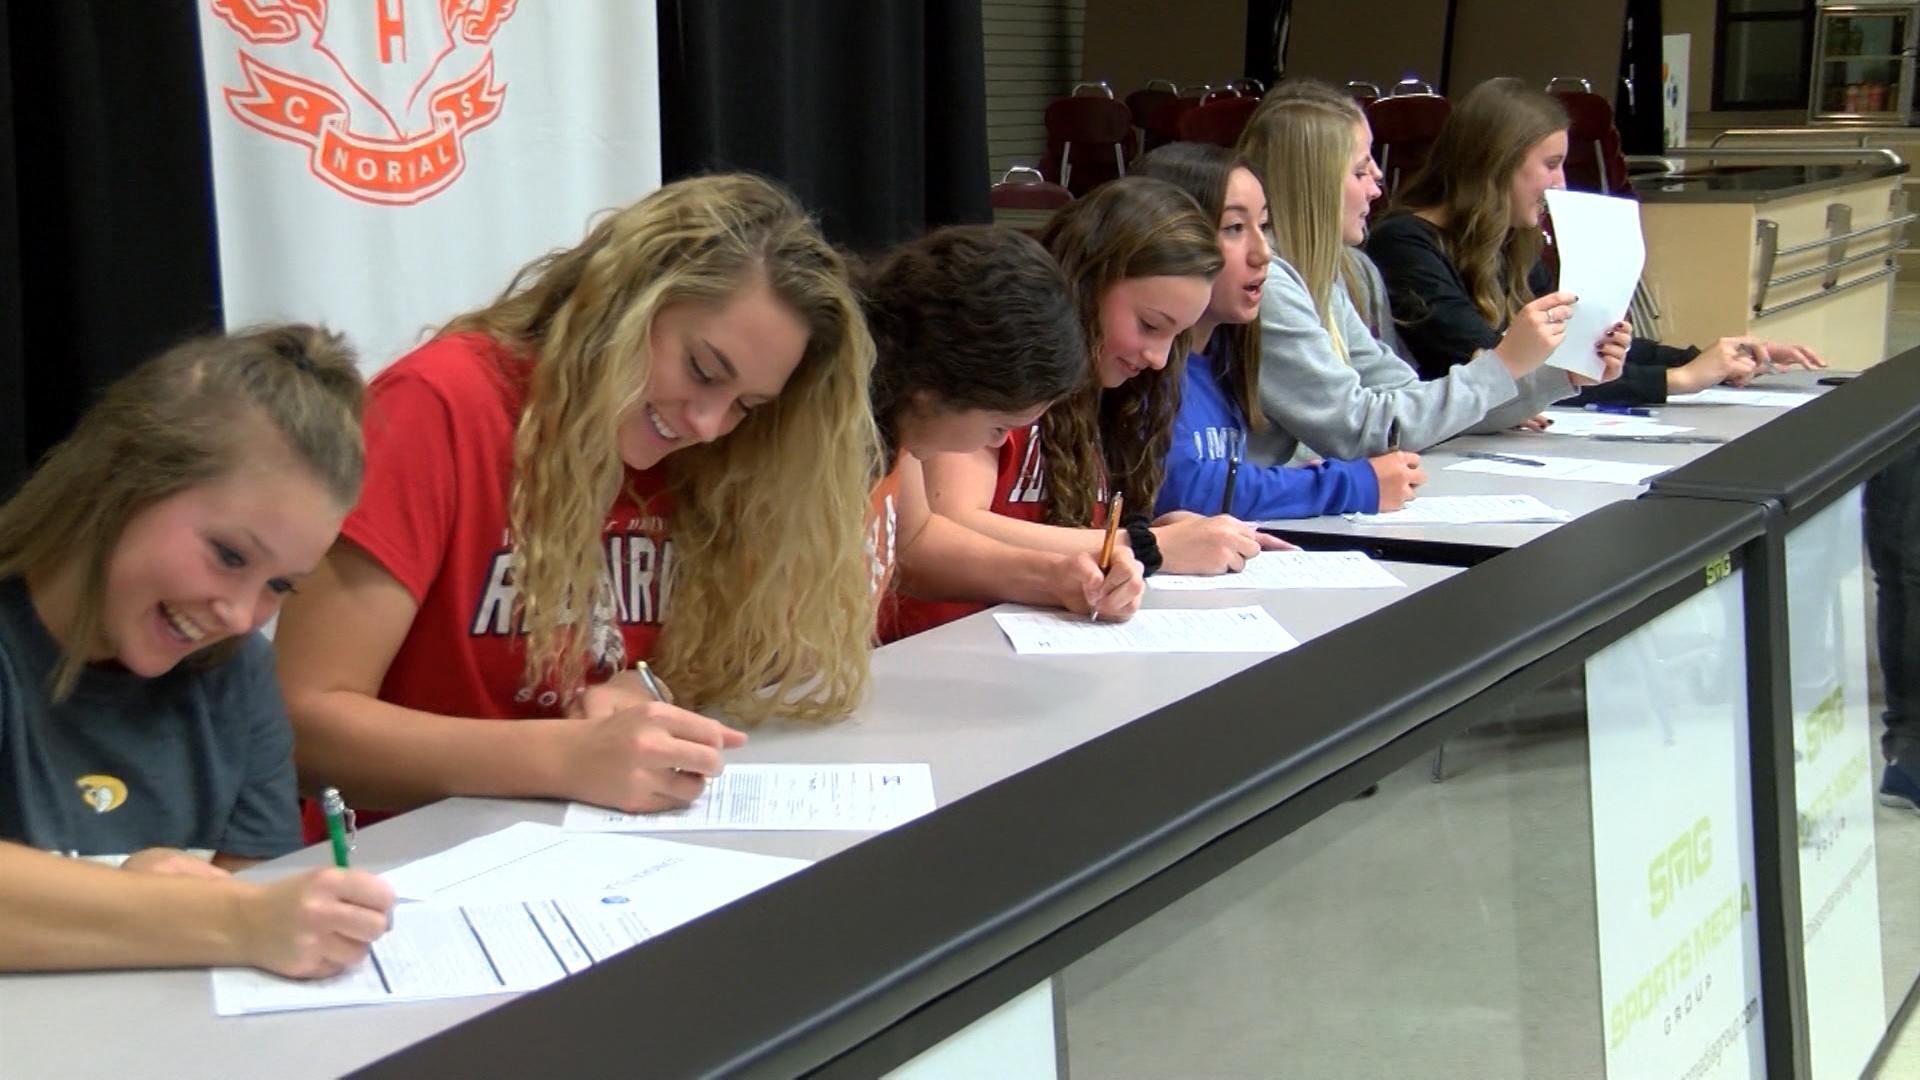 NCHS athletes sign 1109_1510291167425.jpg